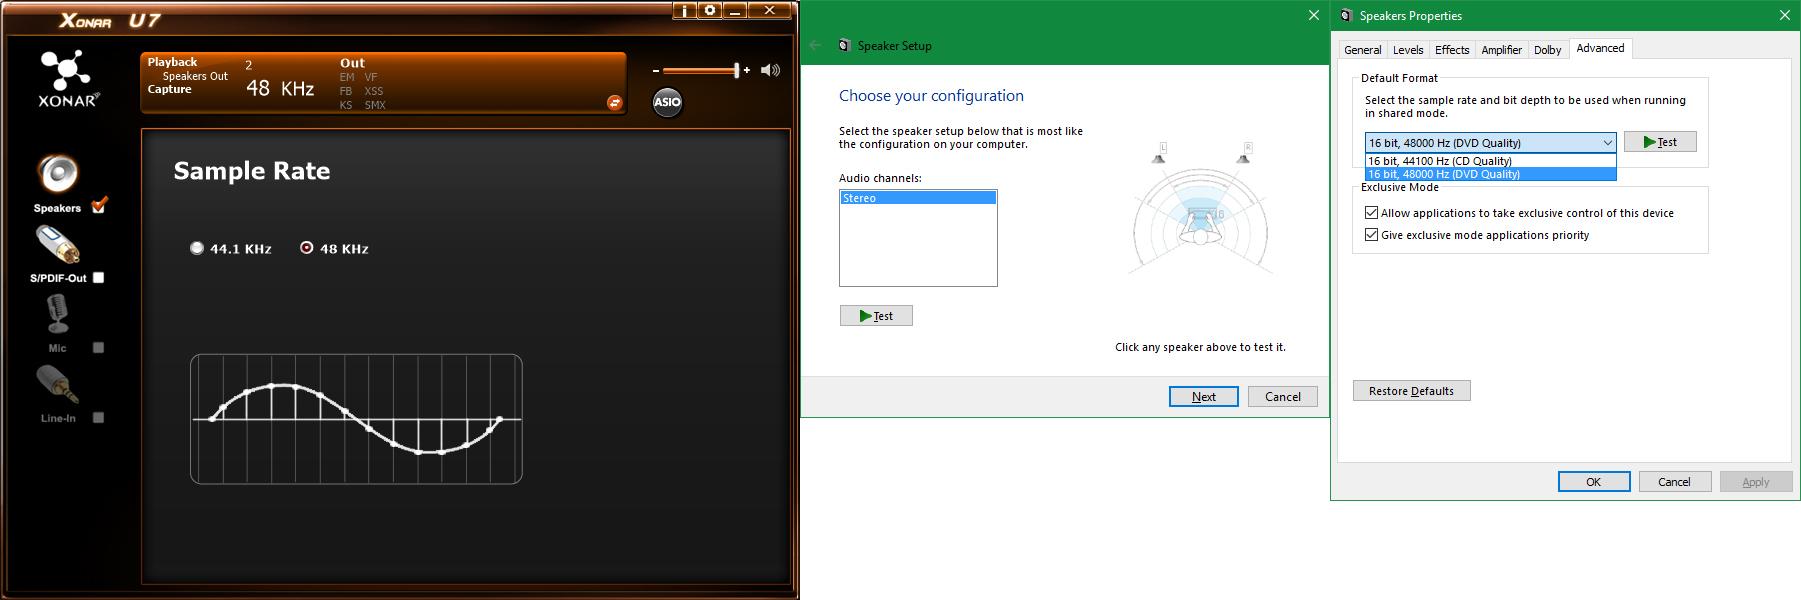 Asus Xonar U7 Drivers Windows 10